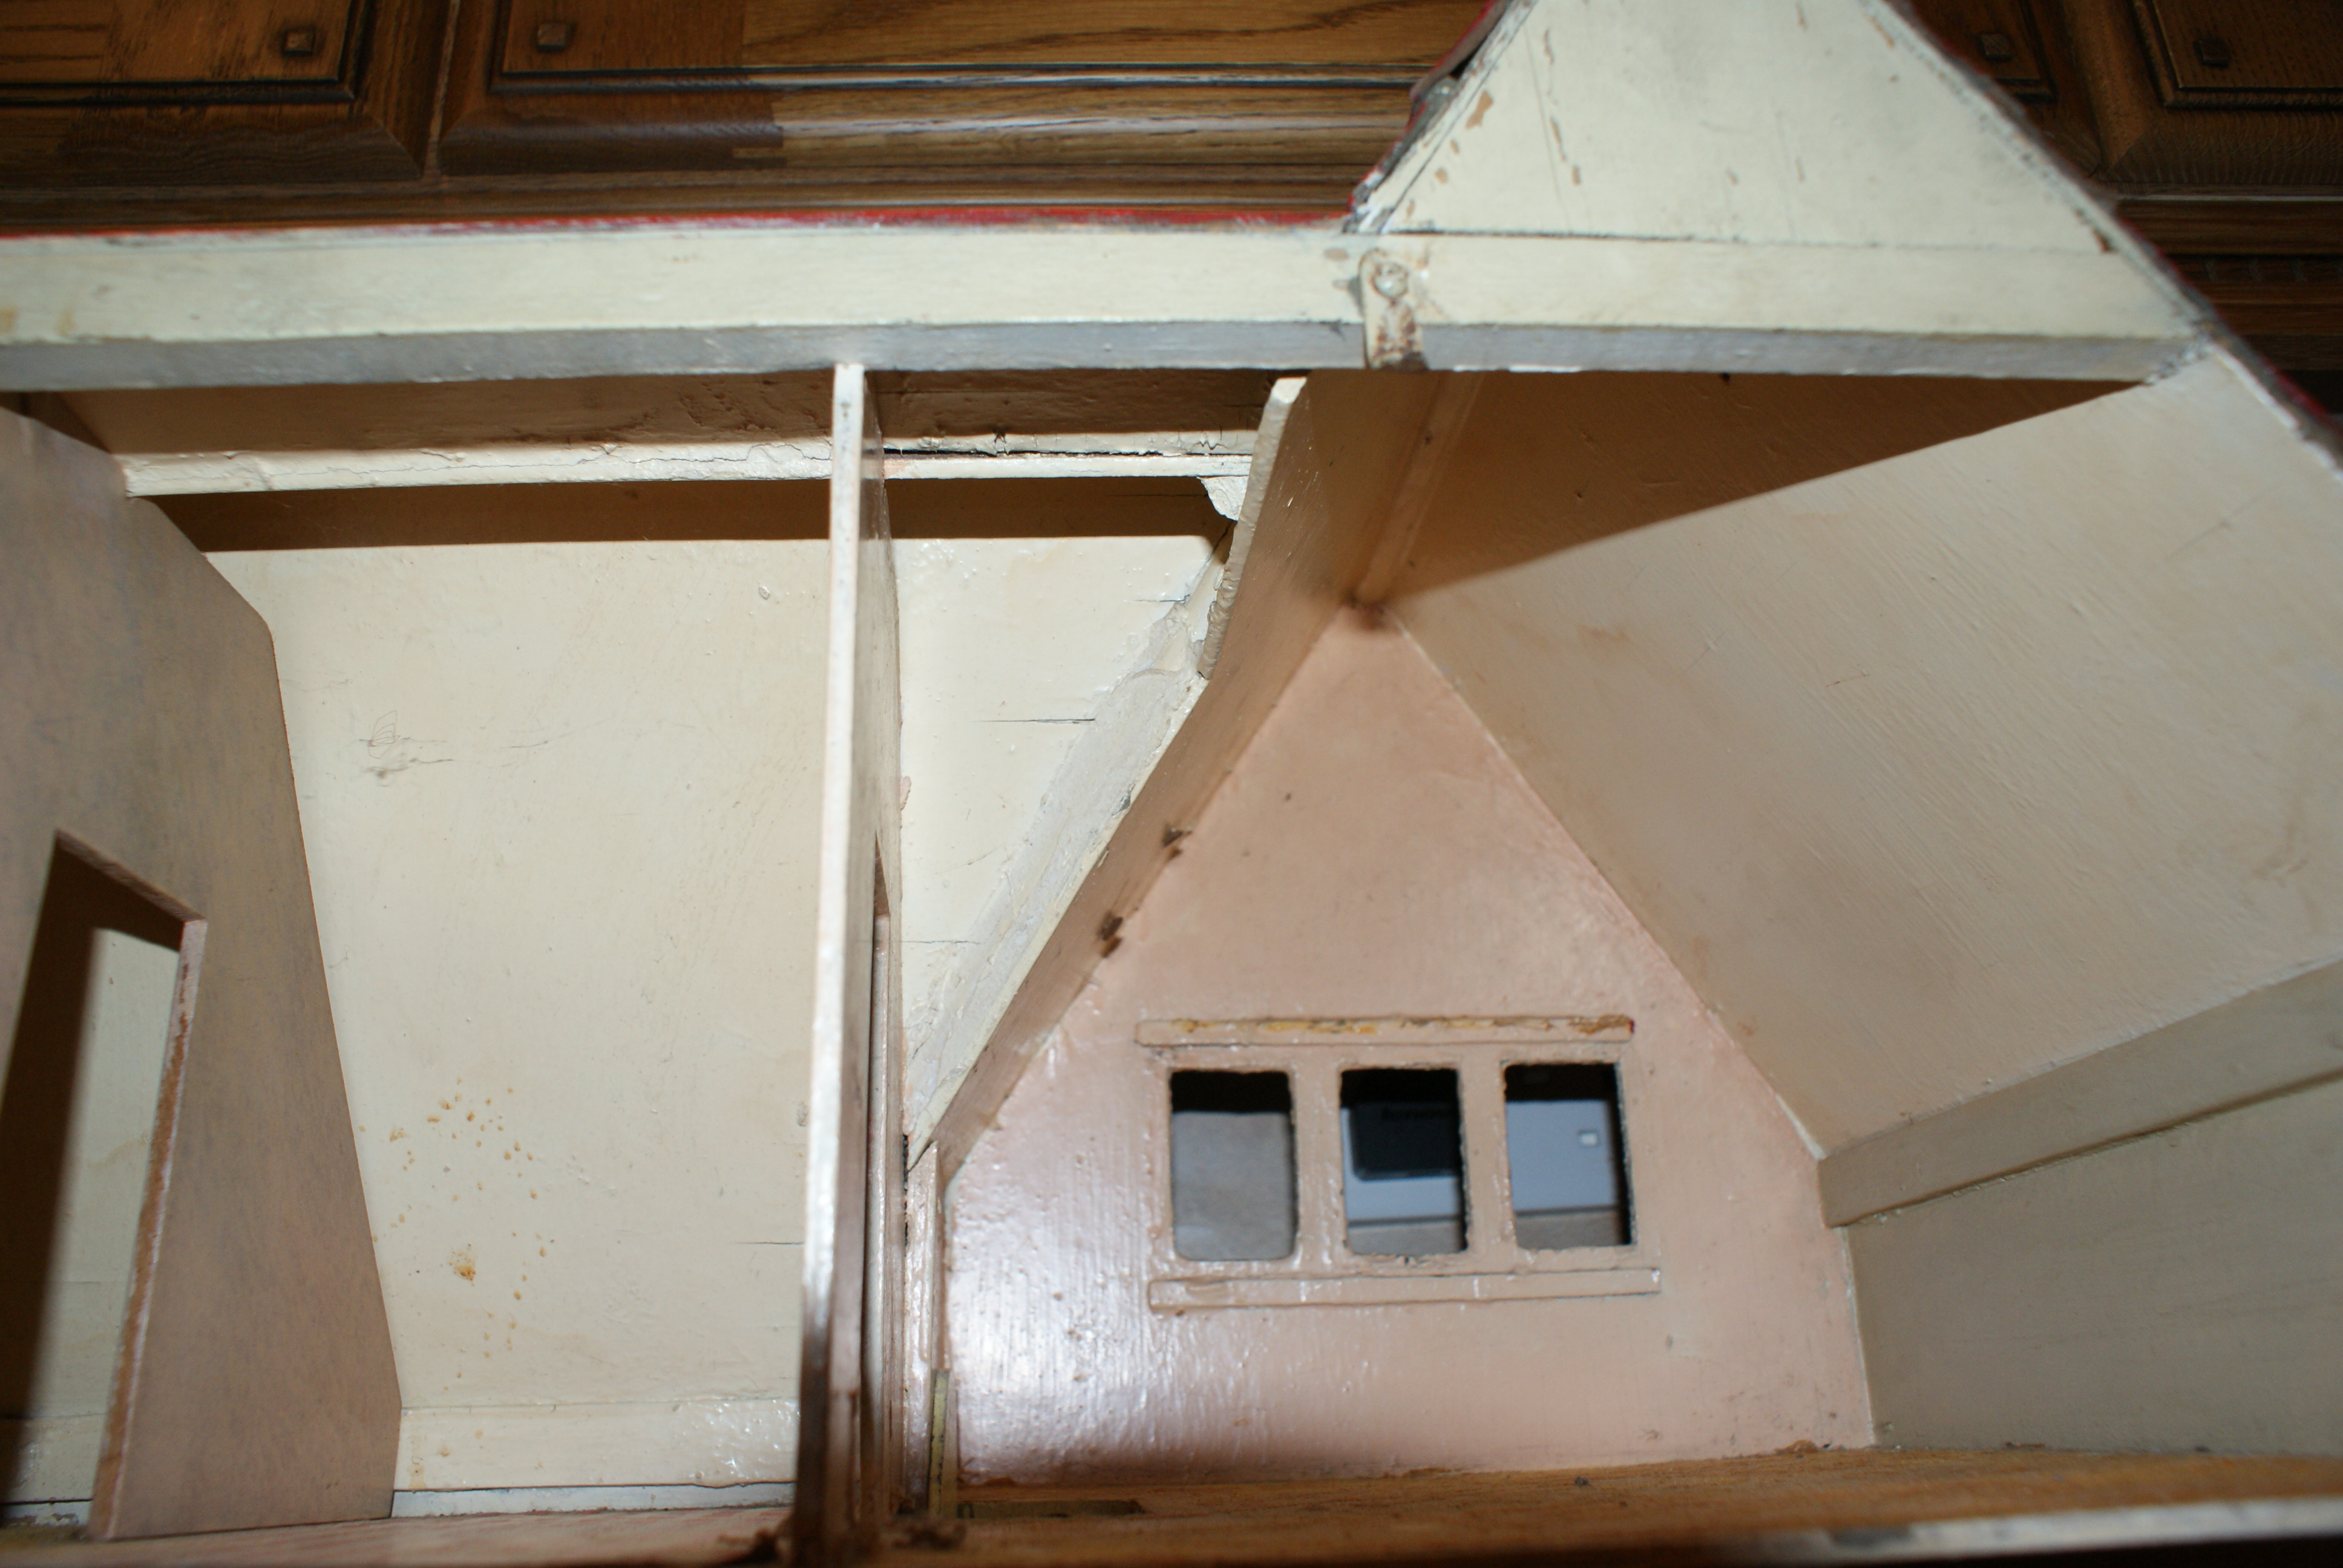 Internal rooms, at top.